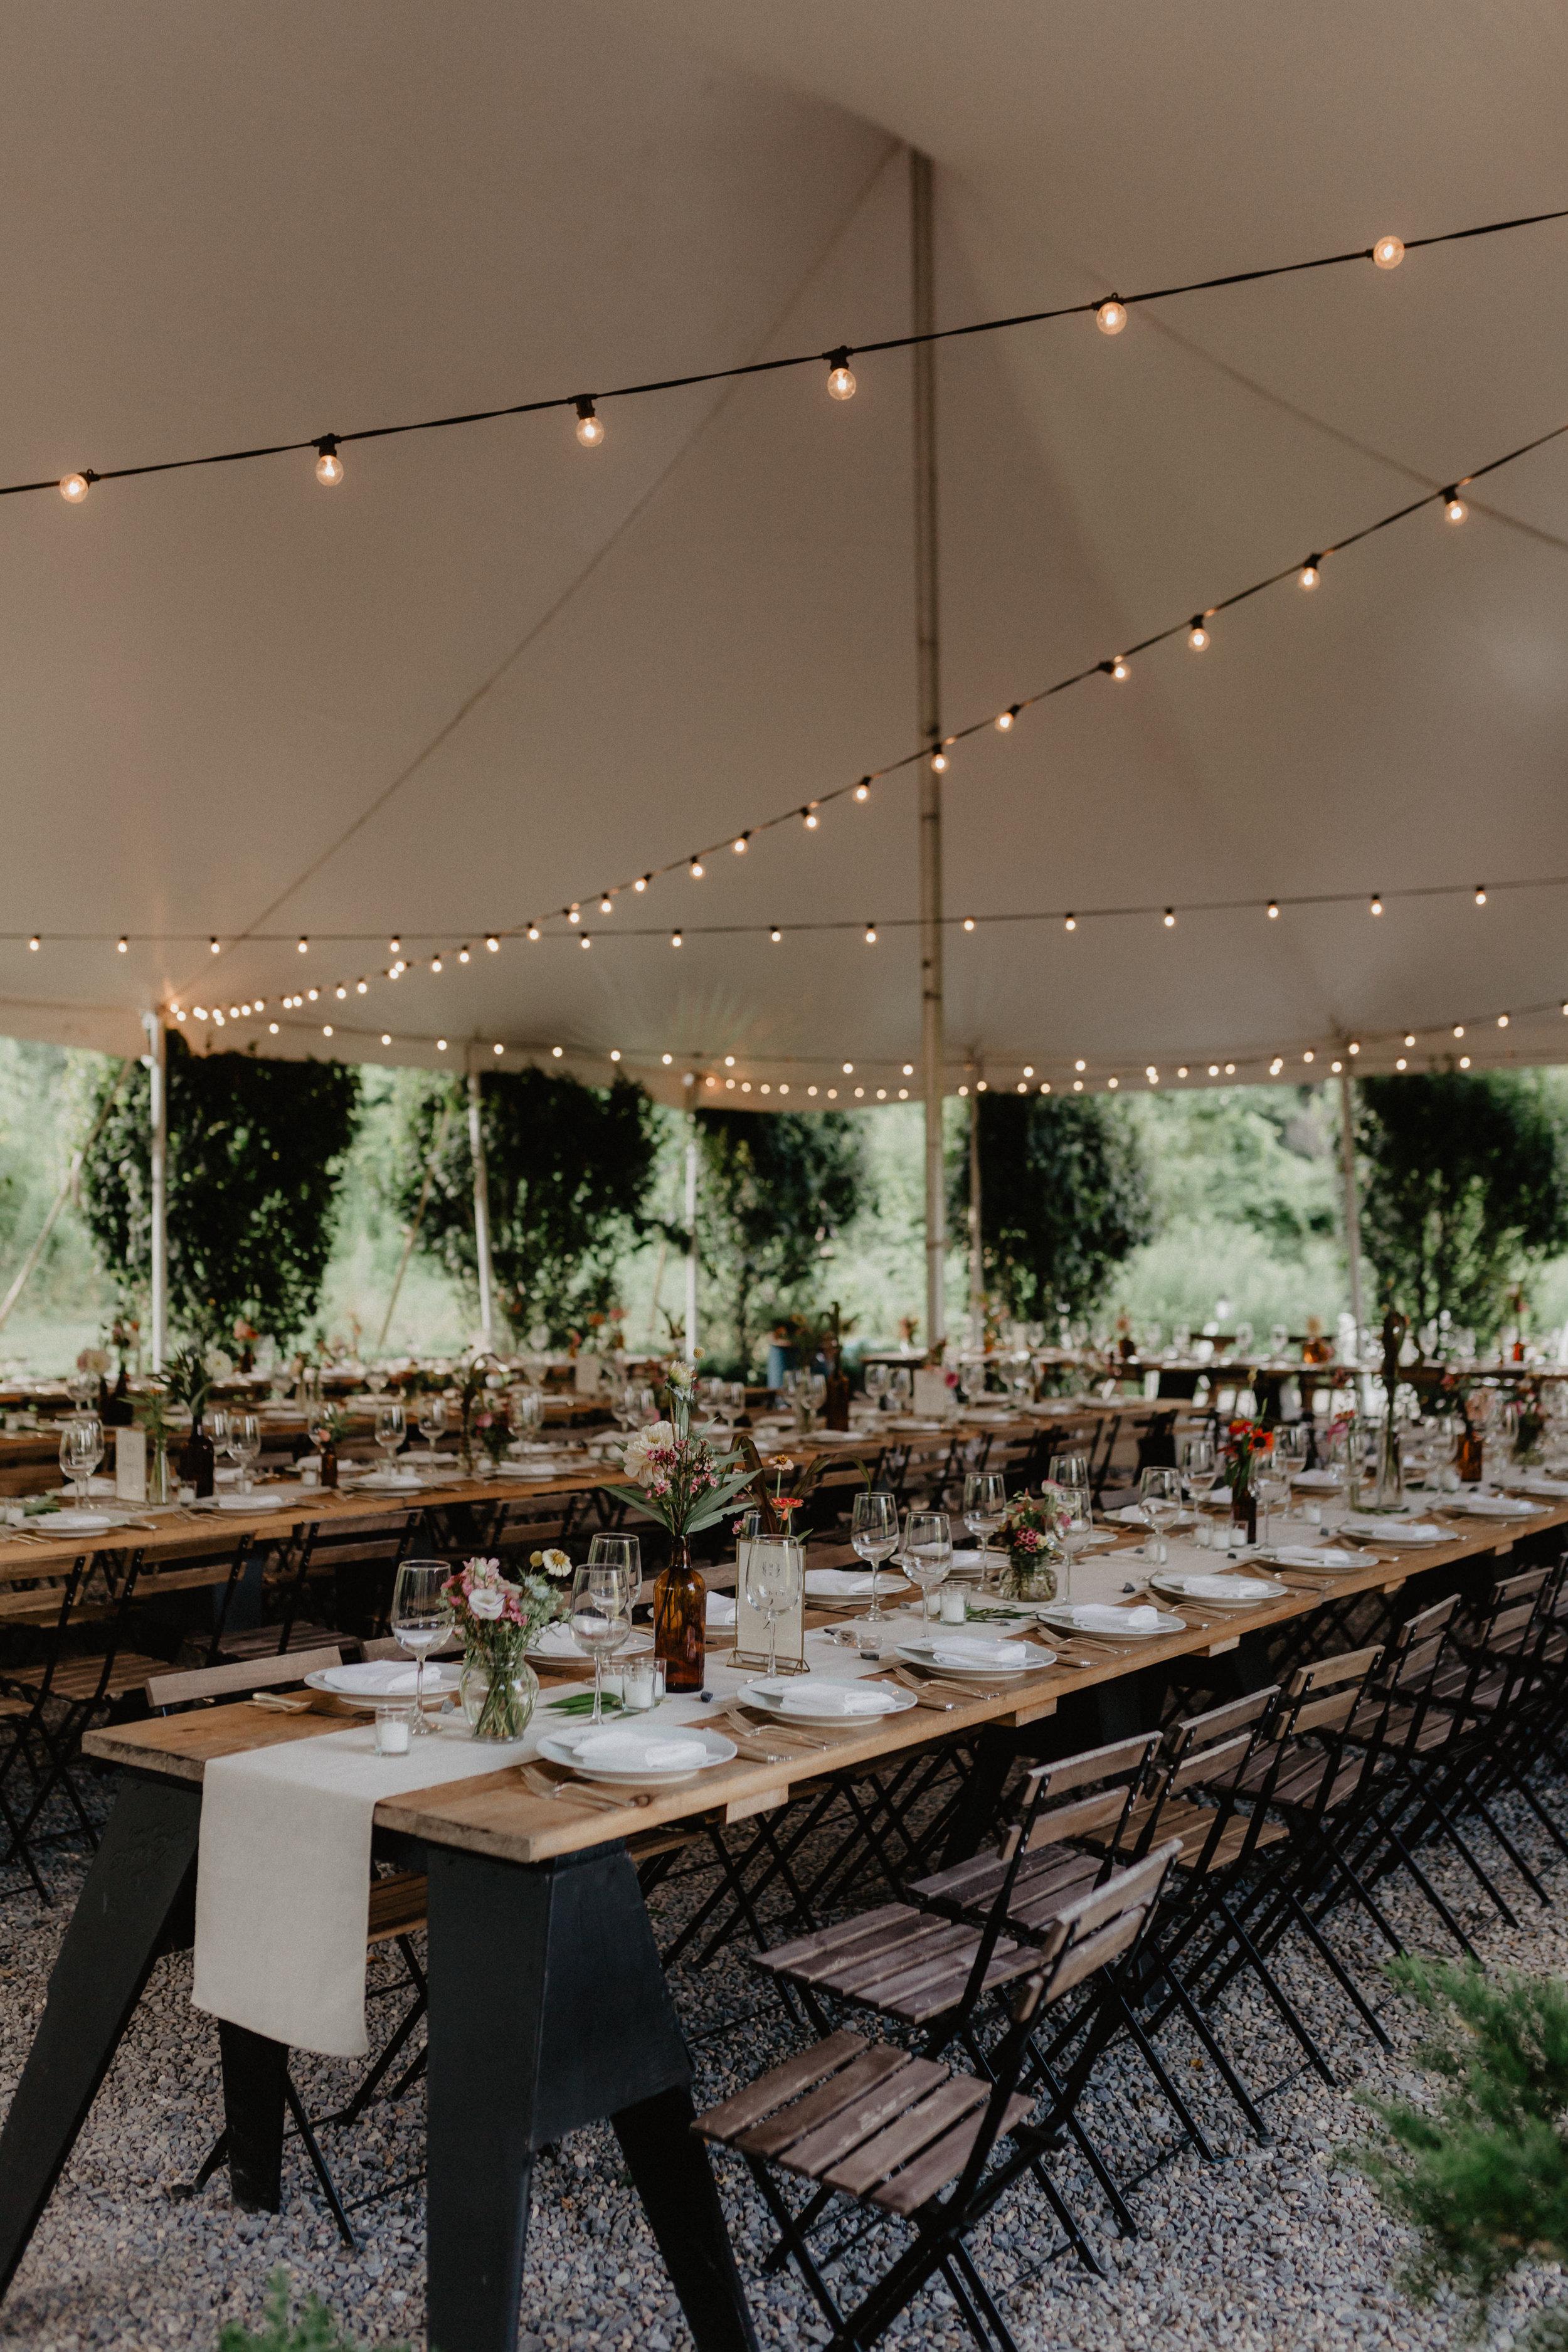 m-and-d-farm-wedding-78.jpg